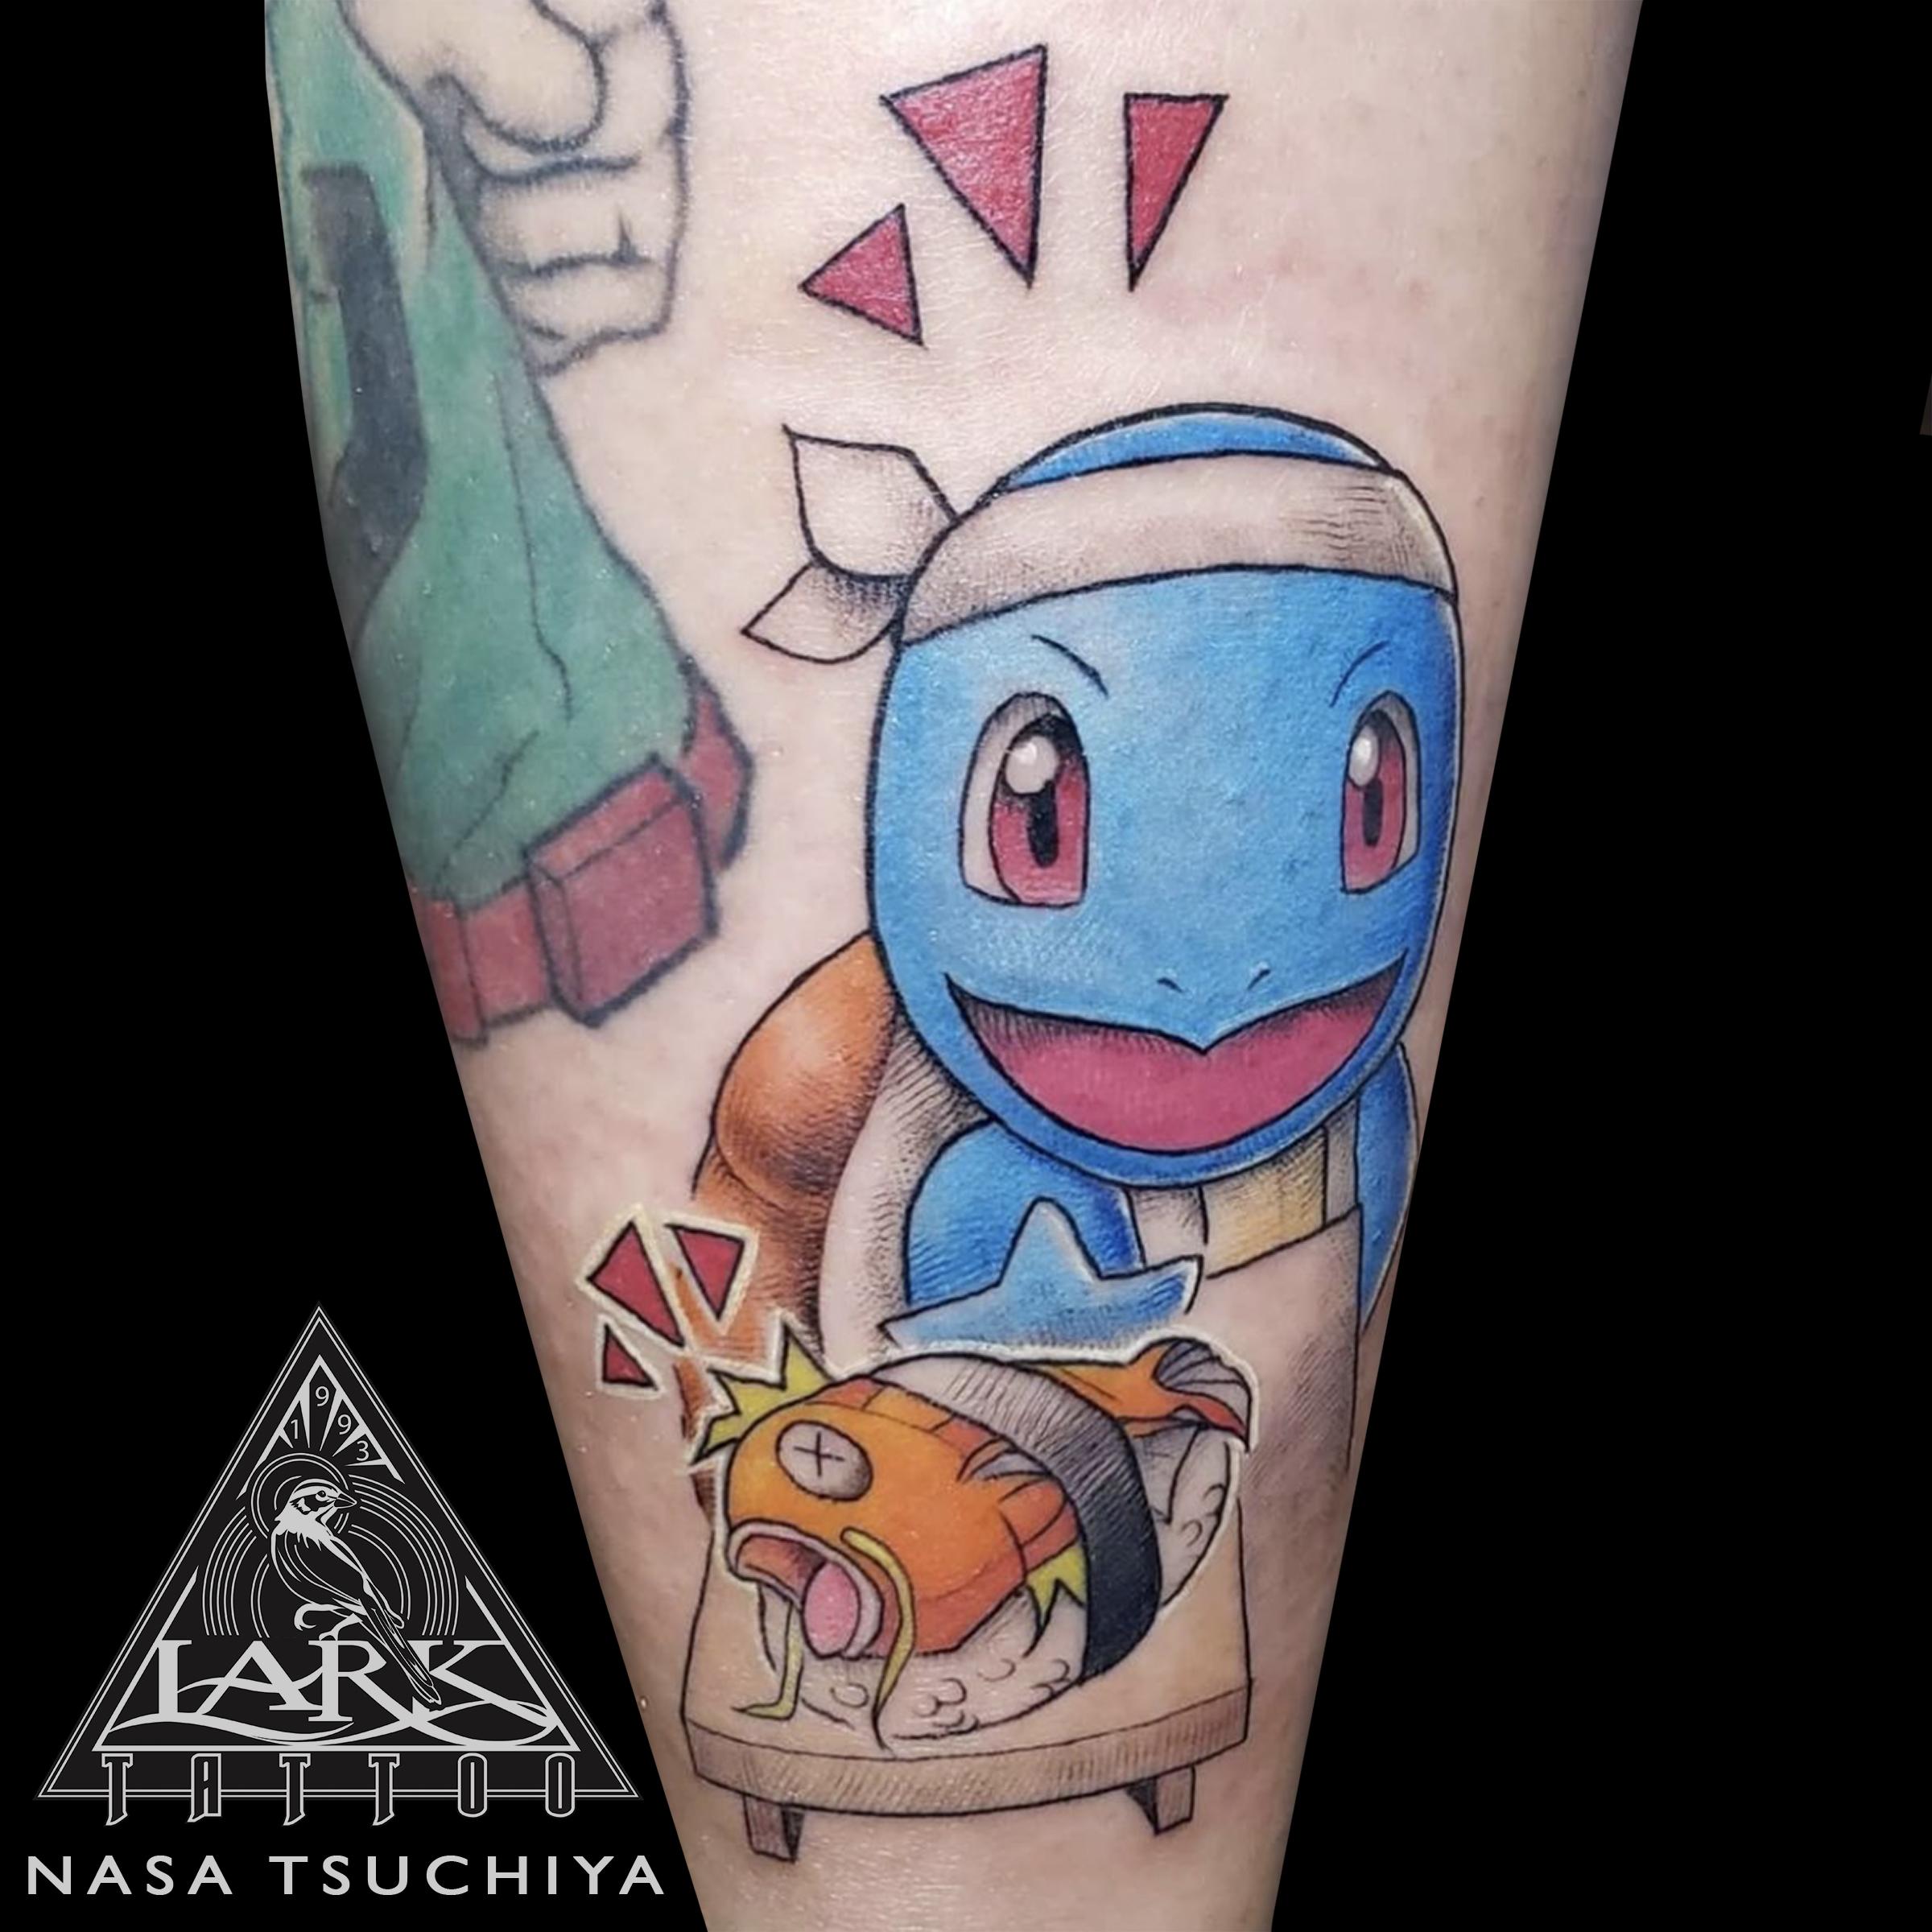 #LarkTattoo #Tattoo #NasaTsuchiya #NasaTsuchiyaLarkTattoo #Tattoos #Squirtle #SquirtleTattoo #Pokémon #PokémonTattoo #Pokemon #PokemonTattoo #ゼニガメ #Wartortle #WartortleTattoo #Blastoise #BlastoiseTattoo #ColorTattoo #Anime #AnimeTattoo #Manga #MangaTattoo #Kawaii #KawaiiTattoo #AnimeTattooer #AnimeTattooArtist #Nerd #NerdTattoo #Nerdy #NerdyTattoo #Cute #CuteTattoo #AnimeLover #AnimeLoverTattoo #FemaleArtist #FemaleTattooArtist #LadyTattooer #Videogame #VideogameTattoo #TattooArtist #Tattoist #Tattooer #LongIslandTattooArtist #LongIslandTattooer #LongIslandTattoo #TattooOfTheDay #Tat #Tats #Tatts #Tatted #Inked #Ink #TattooInk #AmazingInk #AmazingTattoo #BodyArt #LarkTattooWestbury #Westbury #LongIsland #NY #NewYork #USA #Art #Tattedup #InkedUp #LarkTattoos